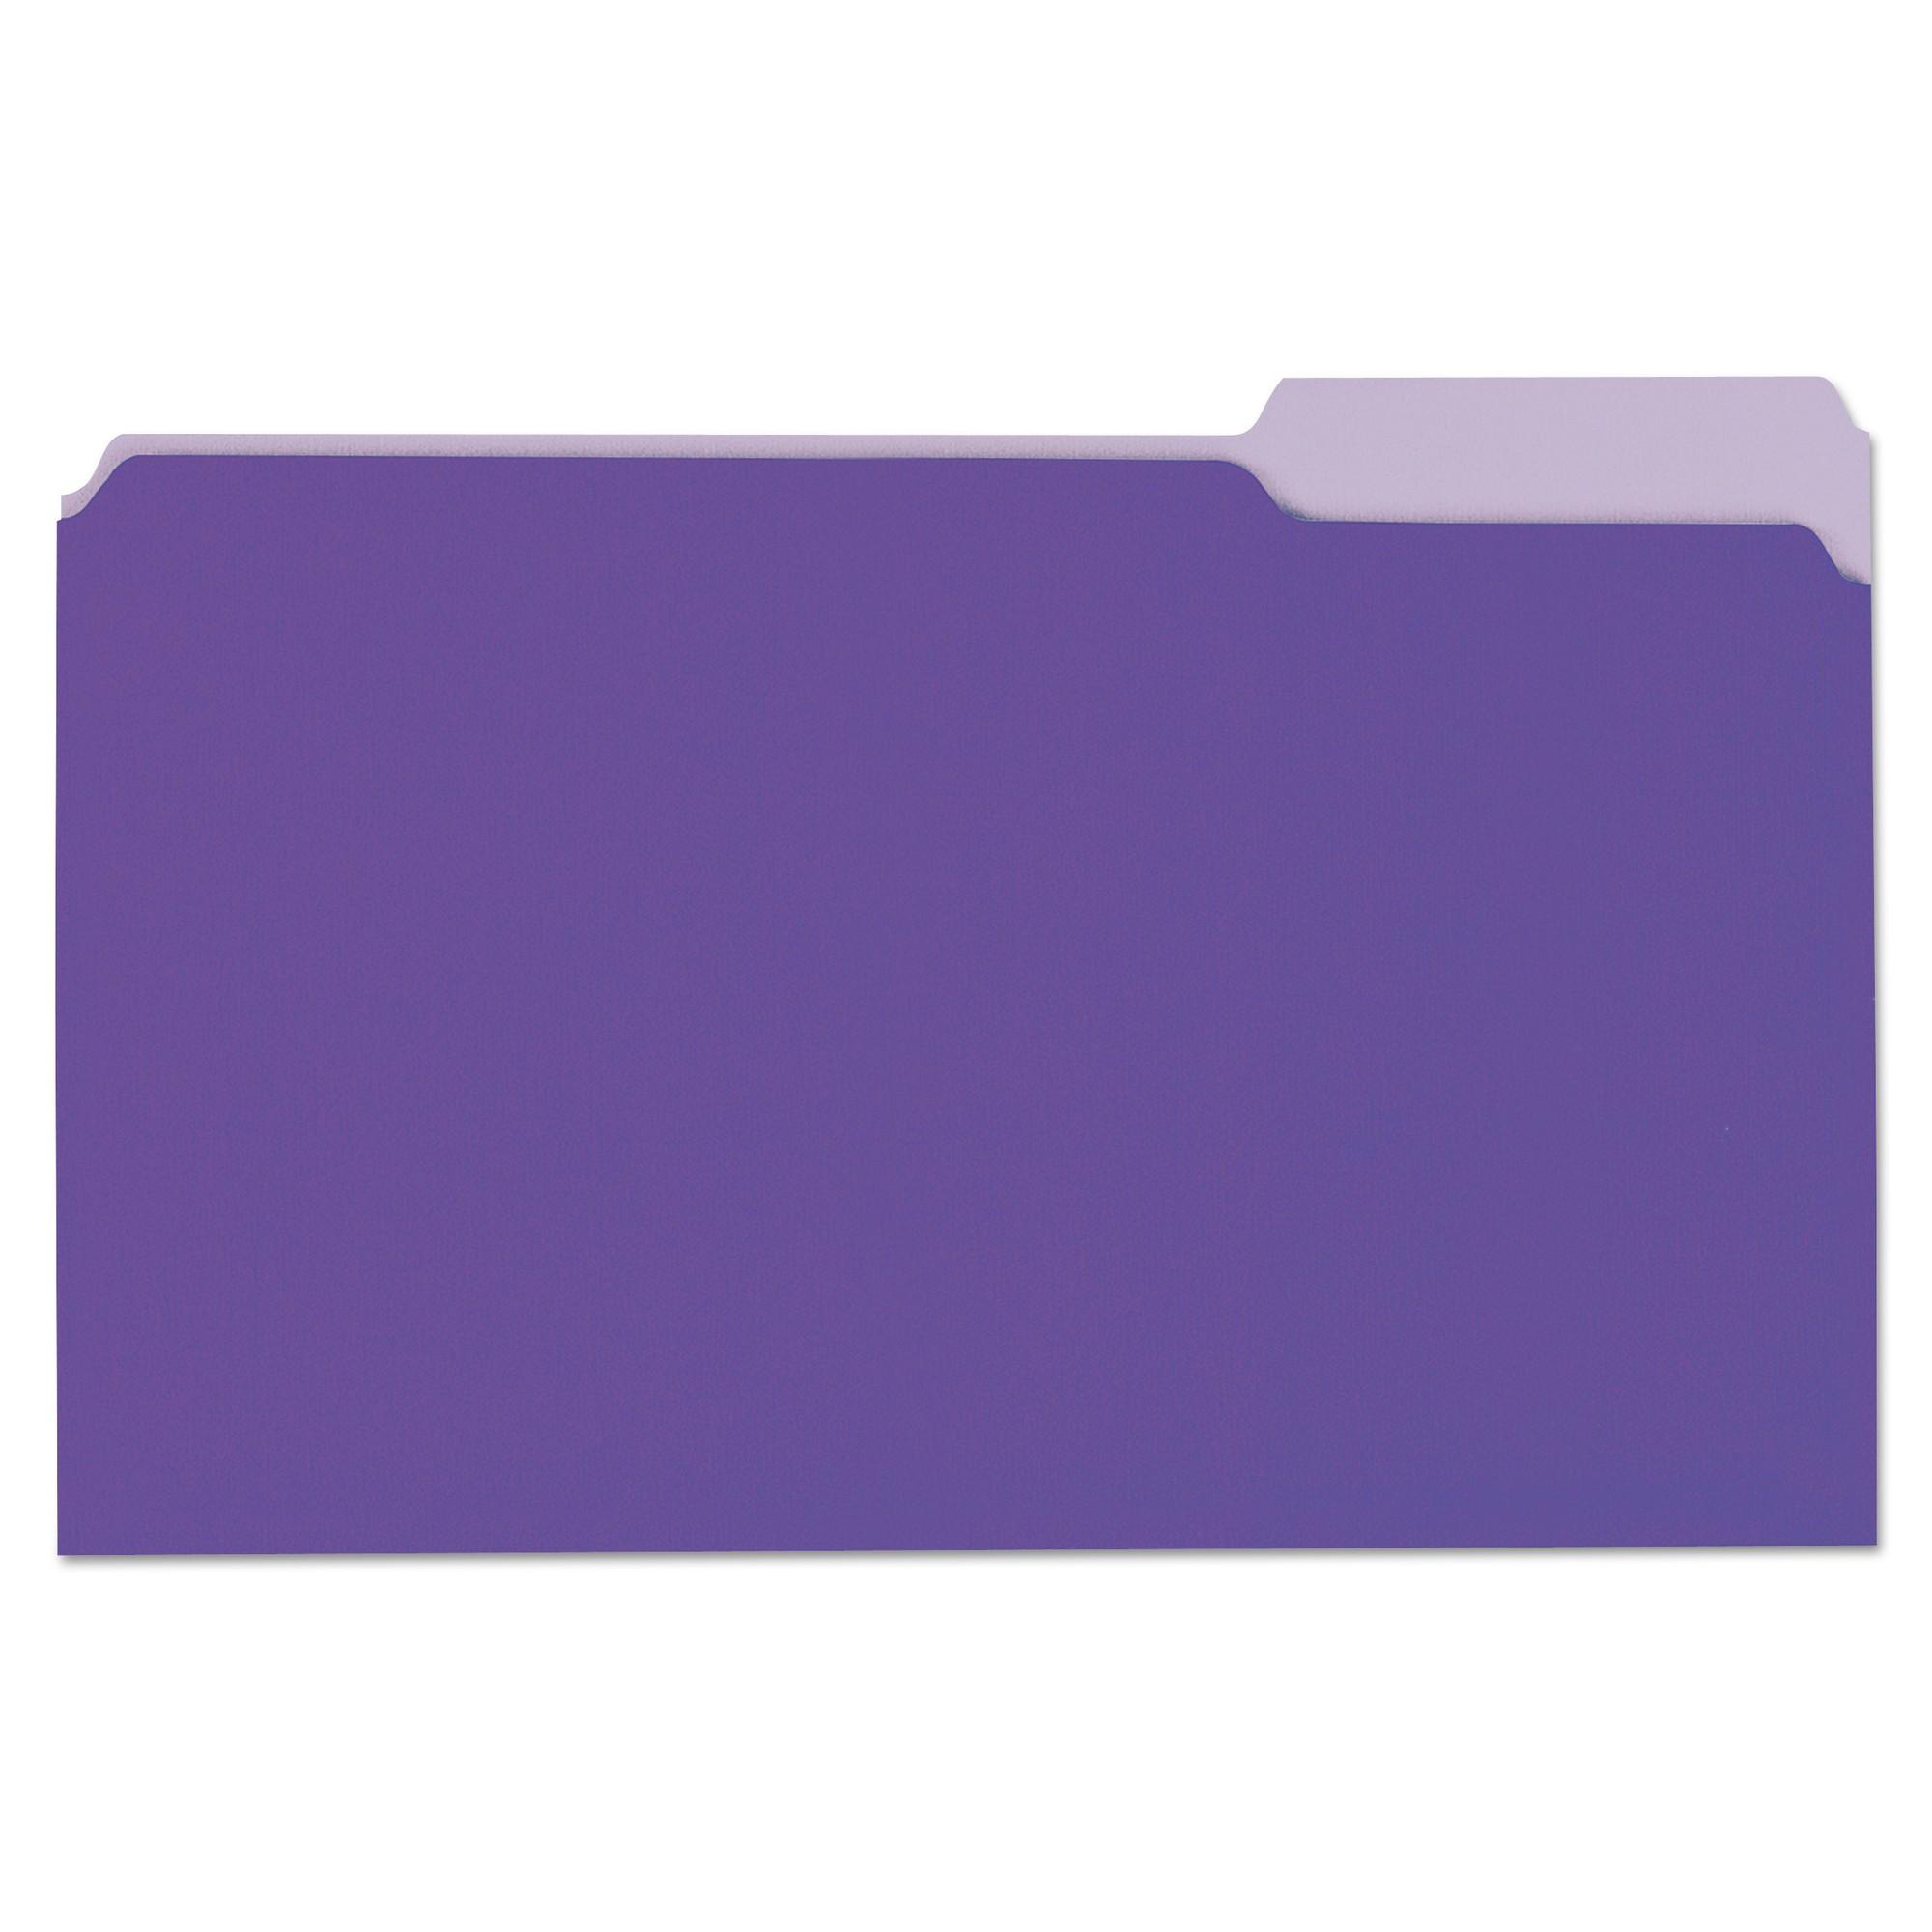 File Folders, 1/3 Cut One-Ply Top Tab, Legal, Violet/Light Violet, 100/Box